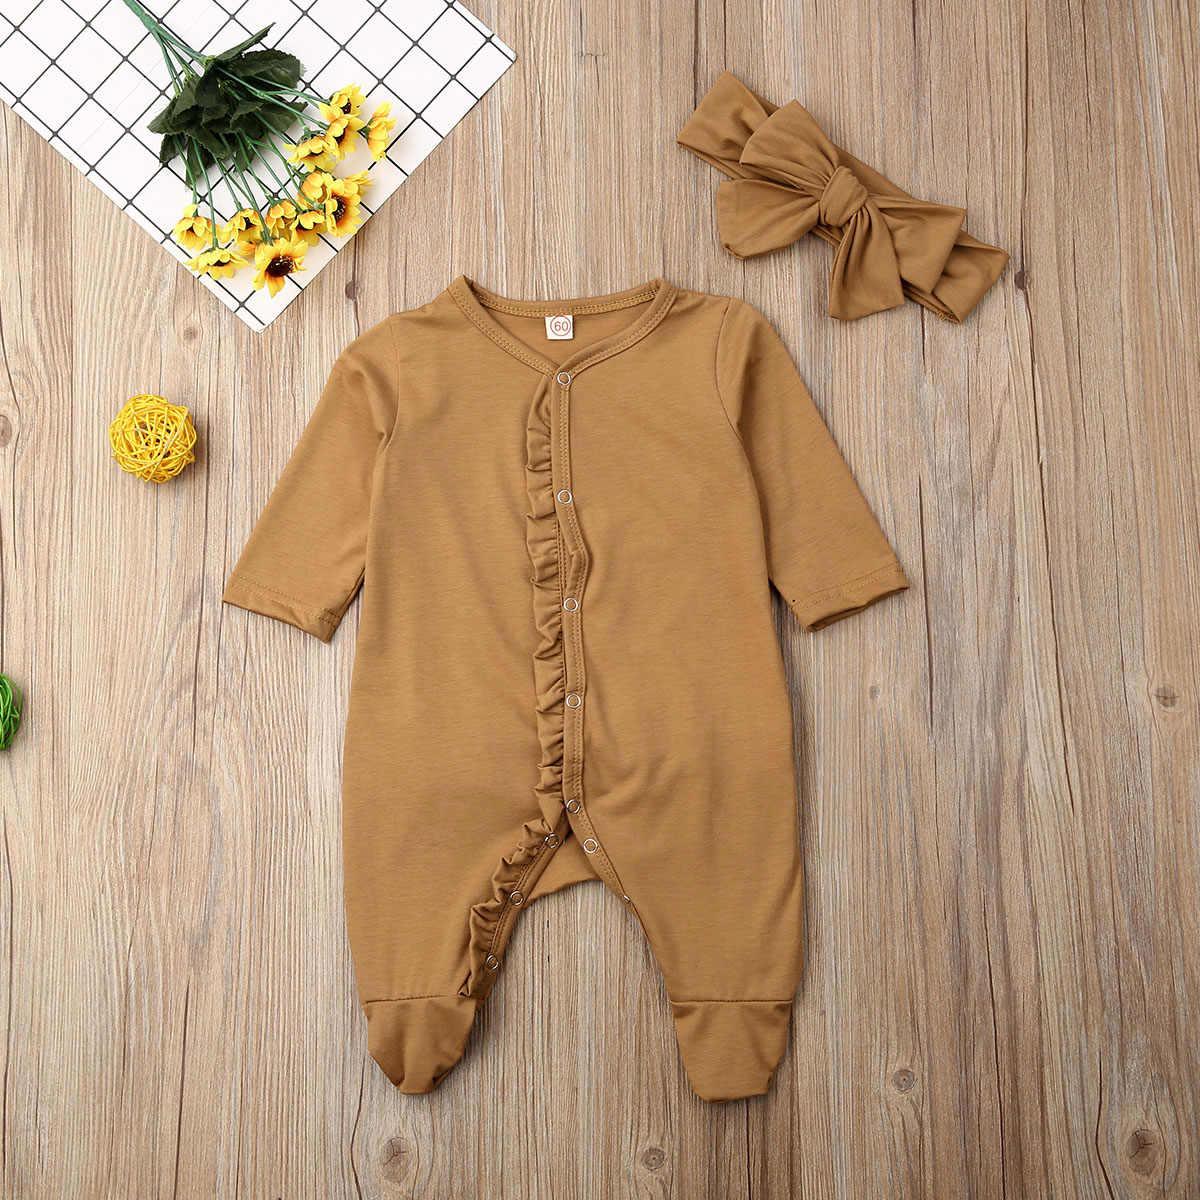 2019 Bayi Musim Semi Musim Gugur Pakaian Bayi Bayi Anak Laki-laki Anak Perempuan Lengan Panjang Footies Mengacak-acak Baju Tidur Piyama Headband 2 Buah Set Pakaian